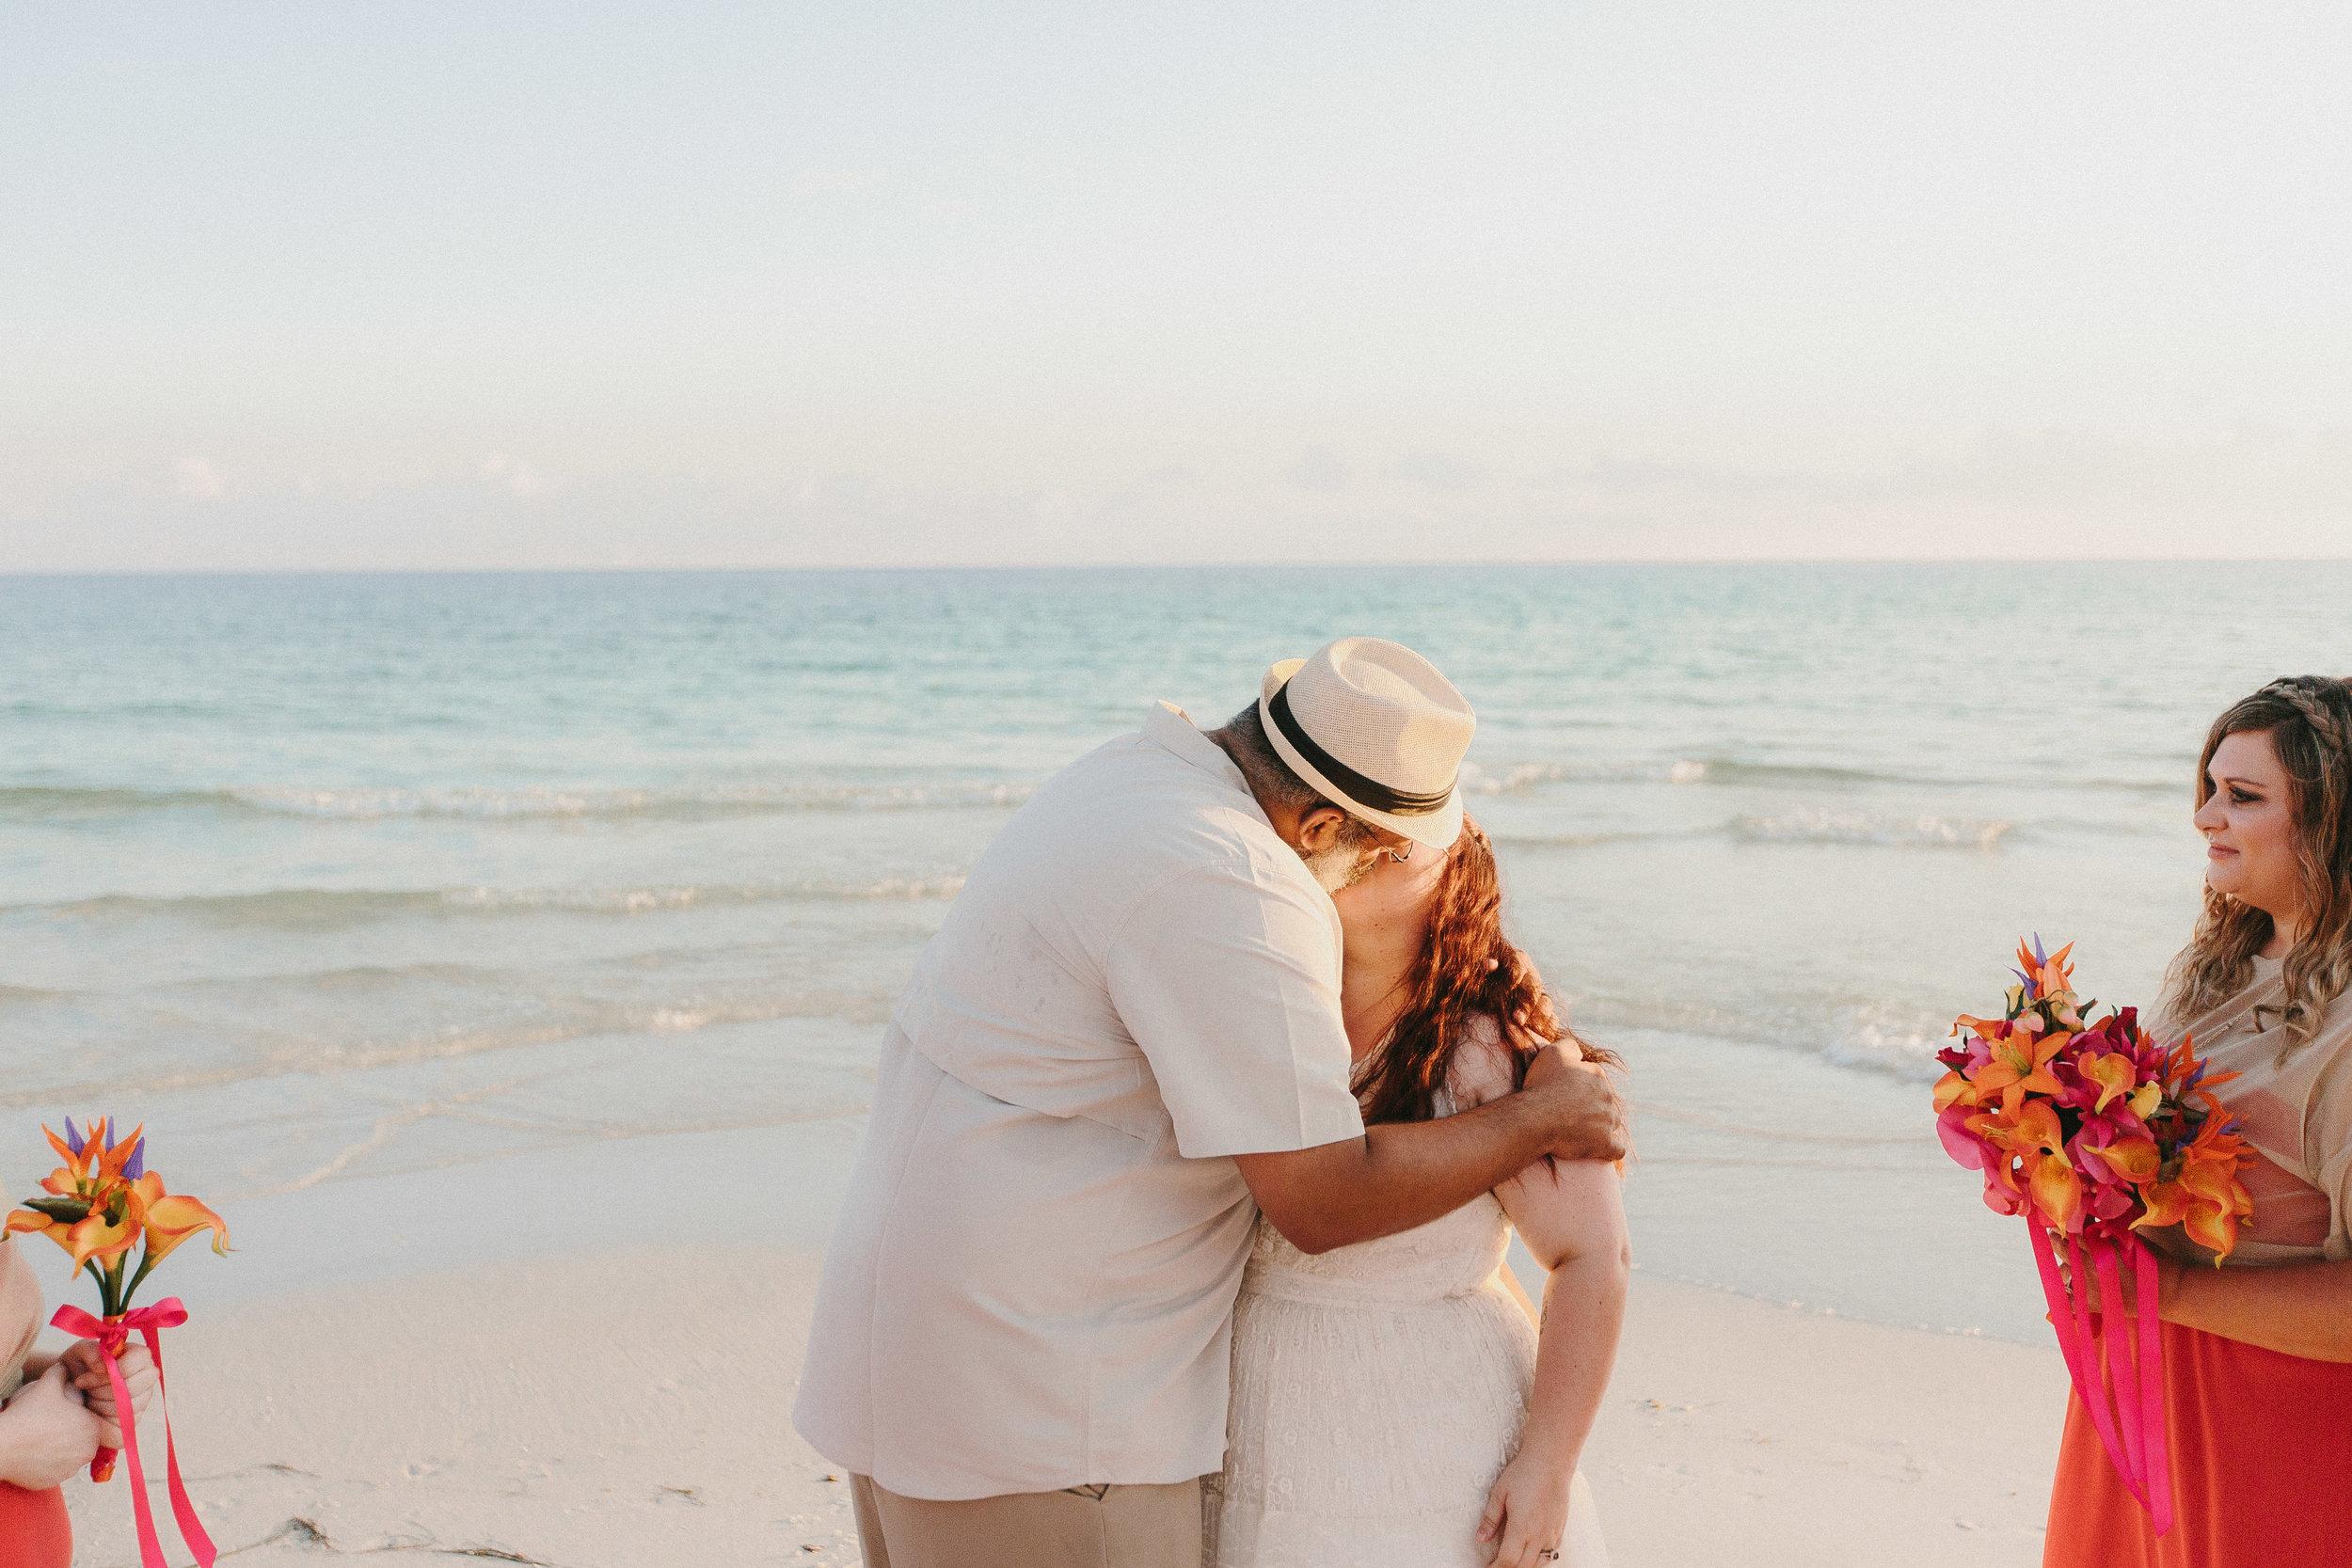 destin_sunset_beach_elopement_intimate_wedding_photographer_florida_documentary_1219.jpg